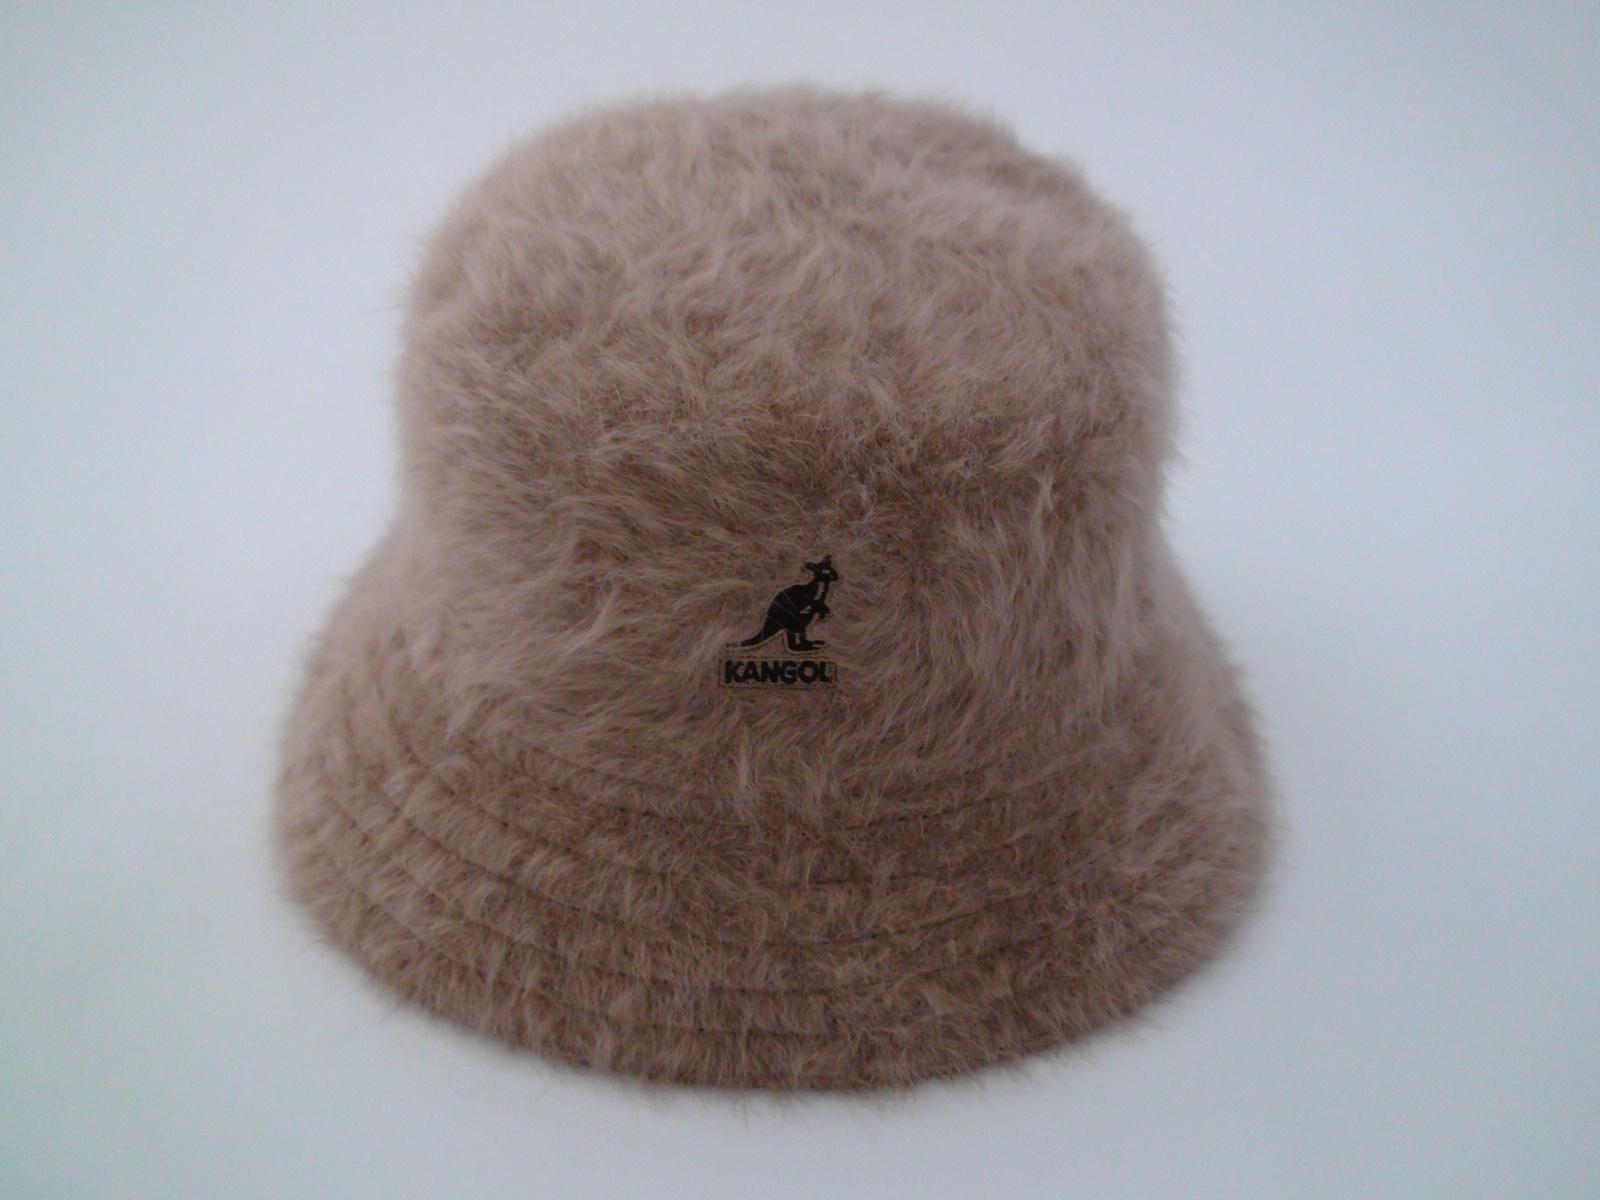 Kangol Furgora Lahinch Brown Angora Blend Bucket Hat 61a3f092bb3